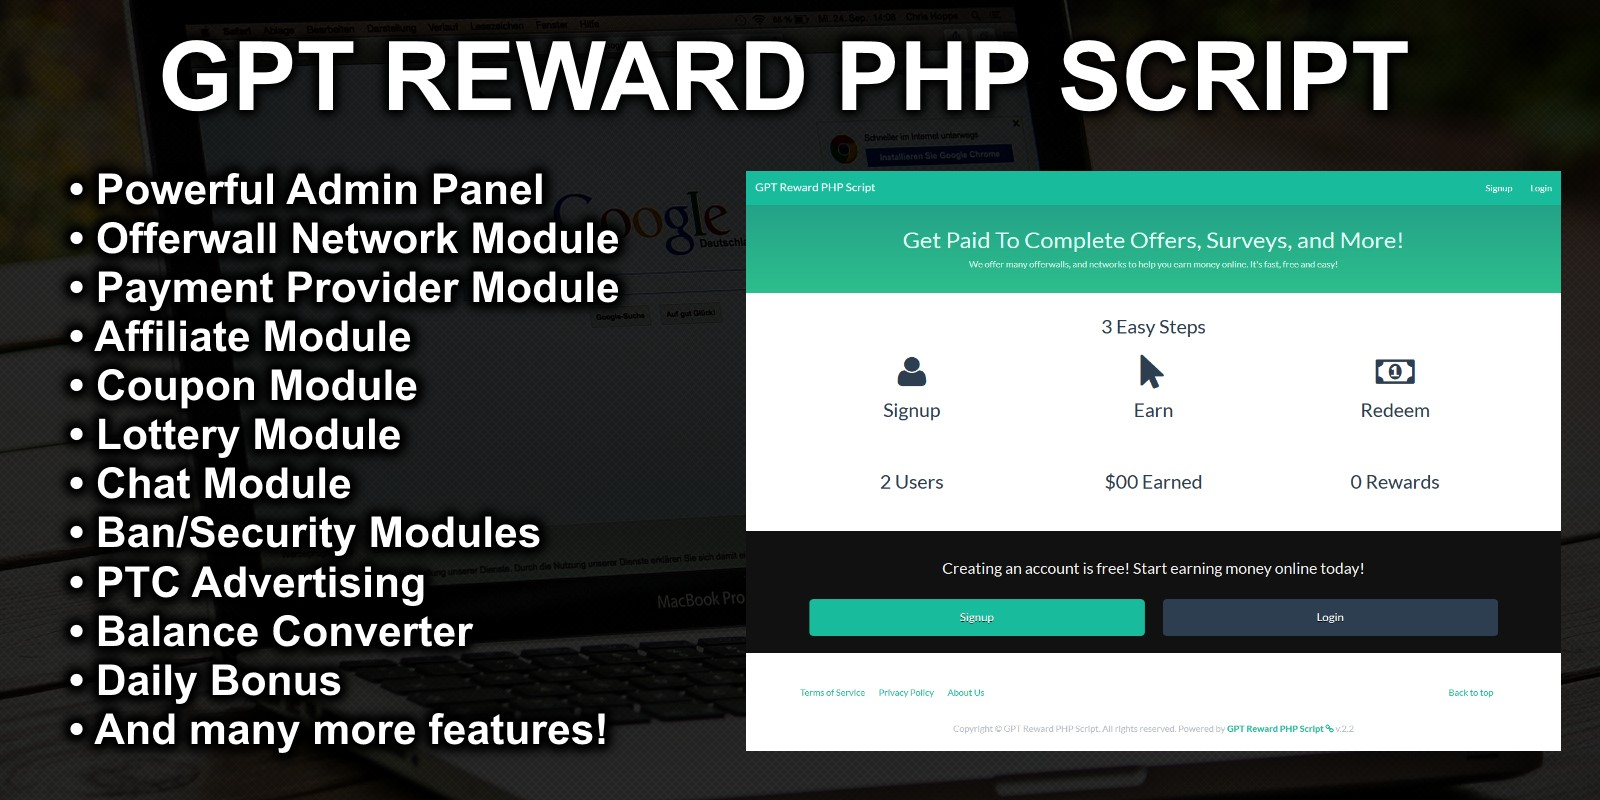 GPT Reward PHP Script